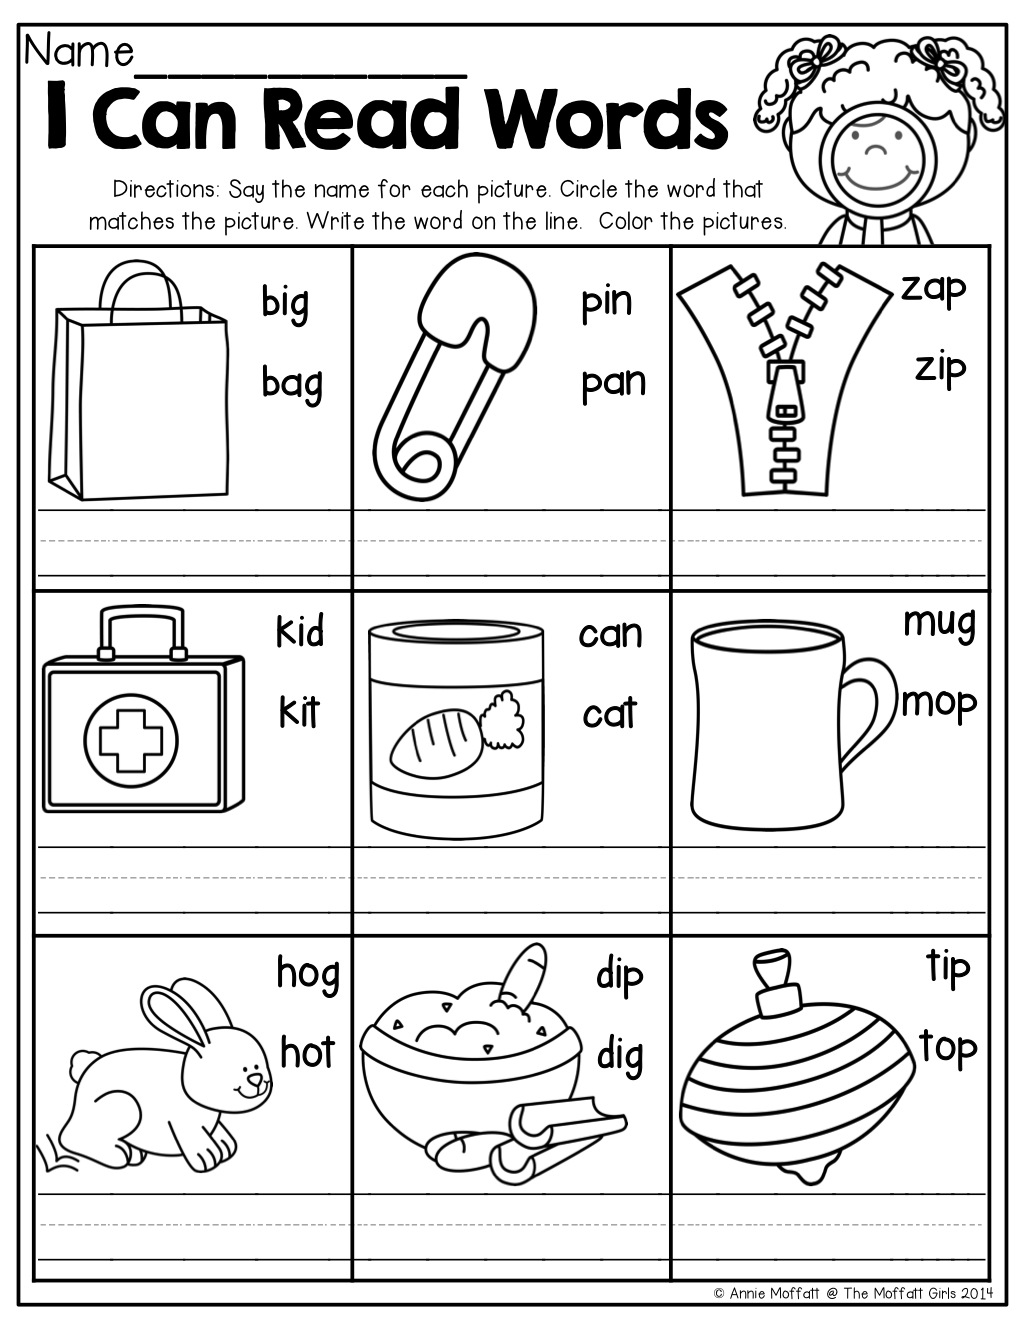 small resolution of The Moffatt Girls: St. Patrick's Day NO PREP Packets!   Phonics kindergarten